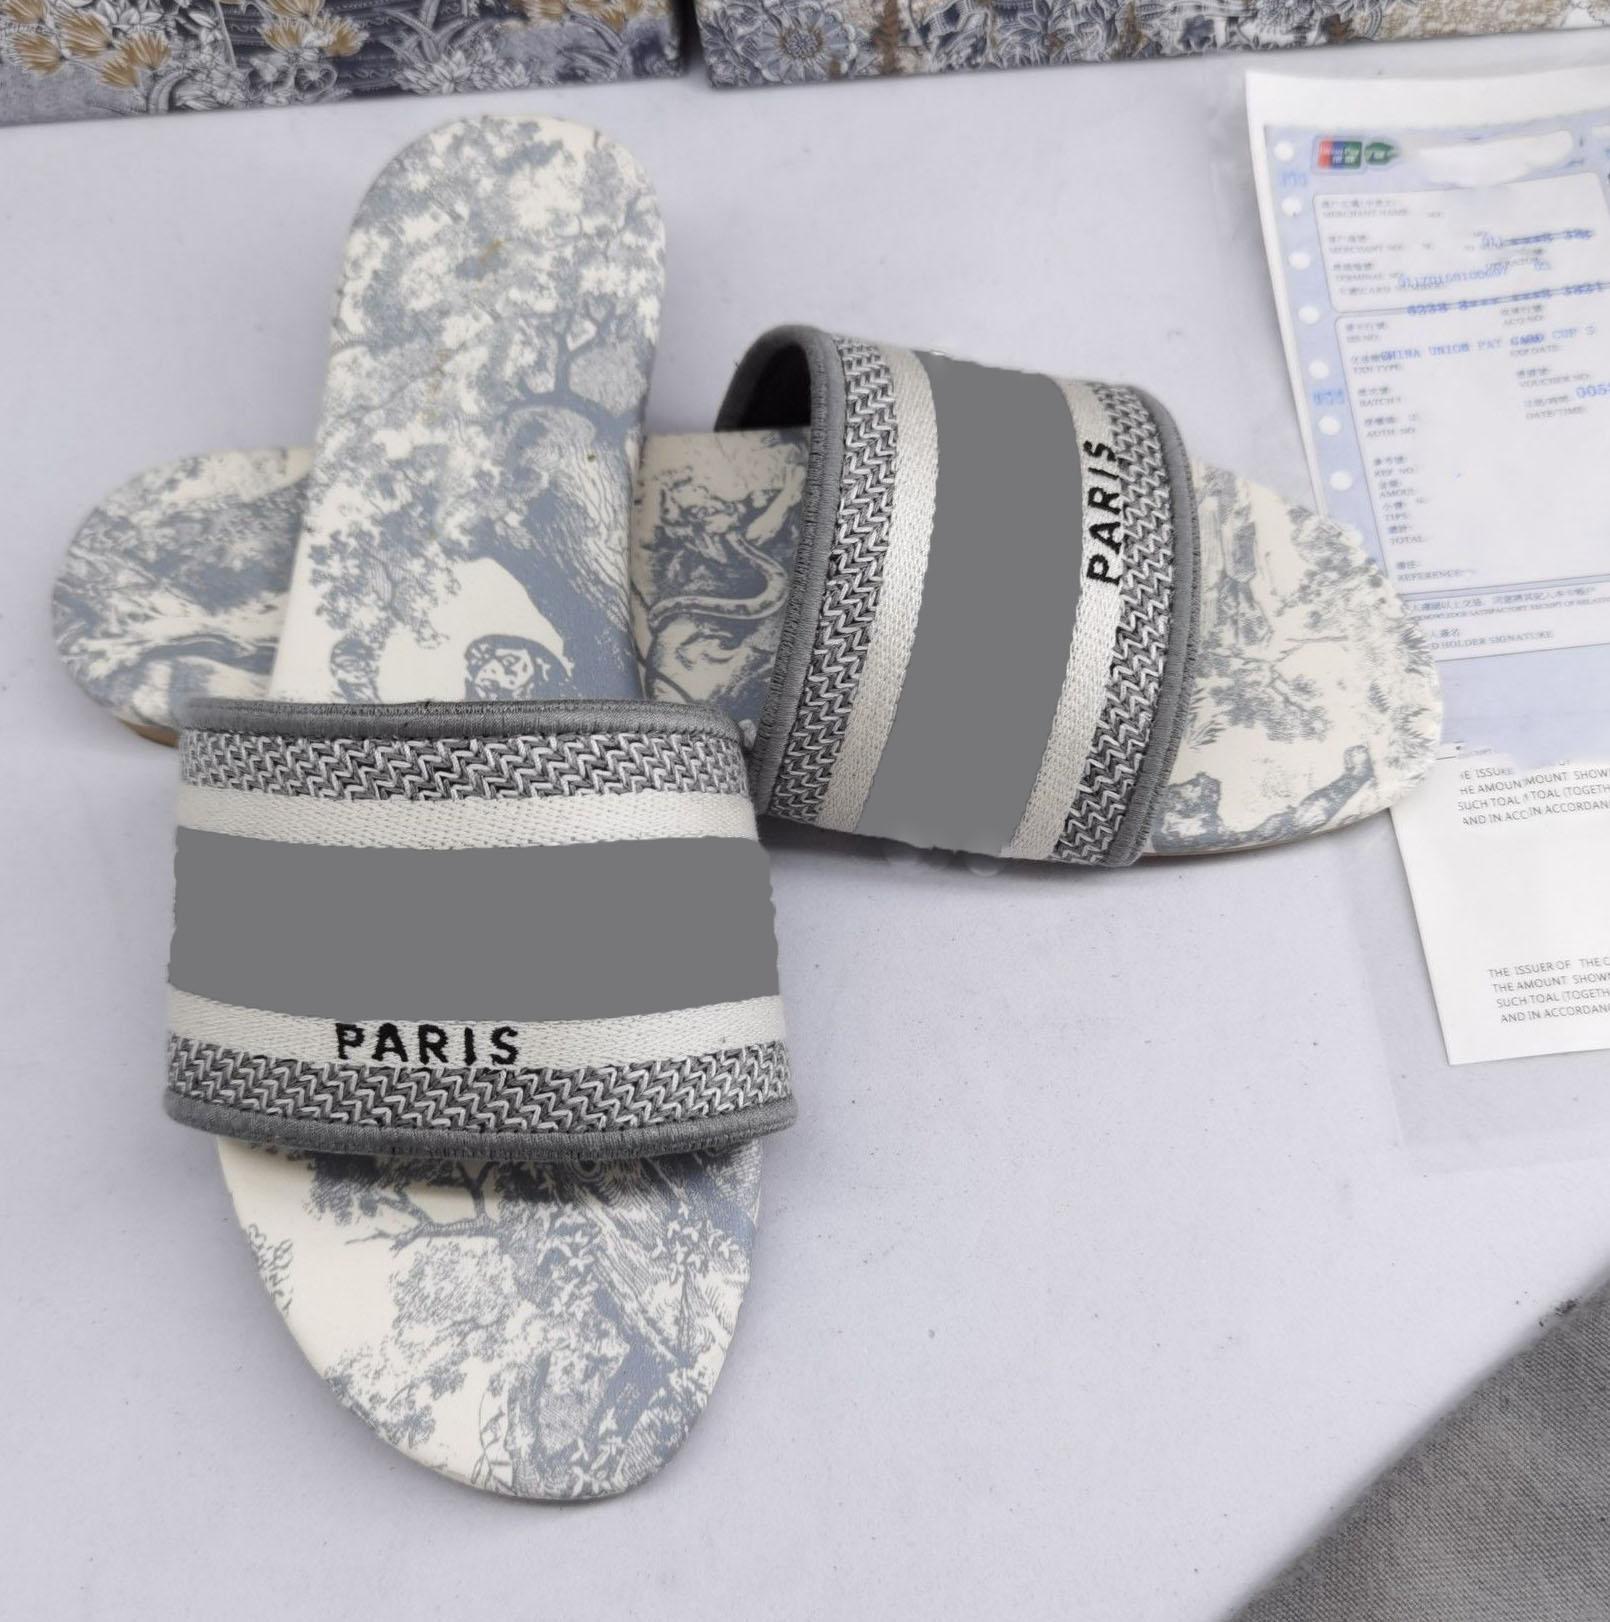 Dior slippers Bordado de moda Sandalia Floral Brocade Slippers Denim Flat Sandals Ladies Summer Summer Playa al aire libre Tamaño 35-42